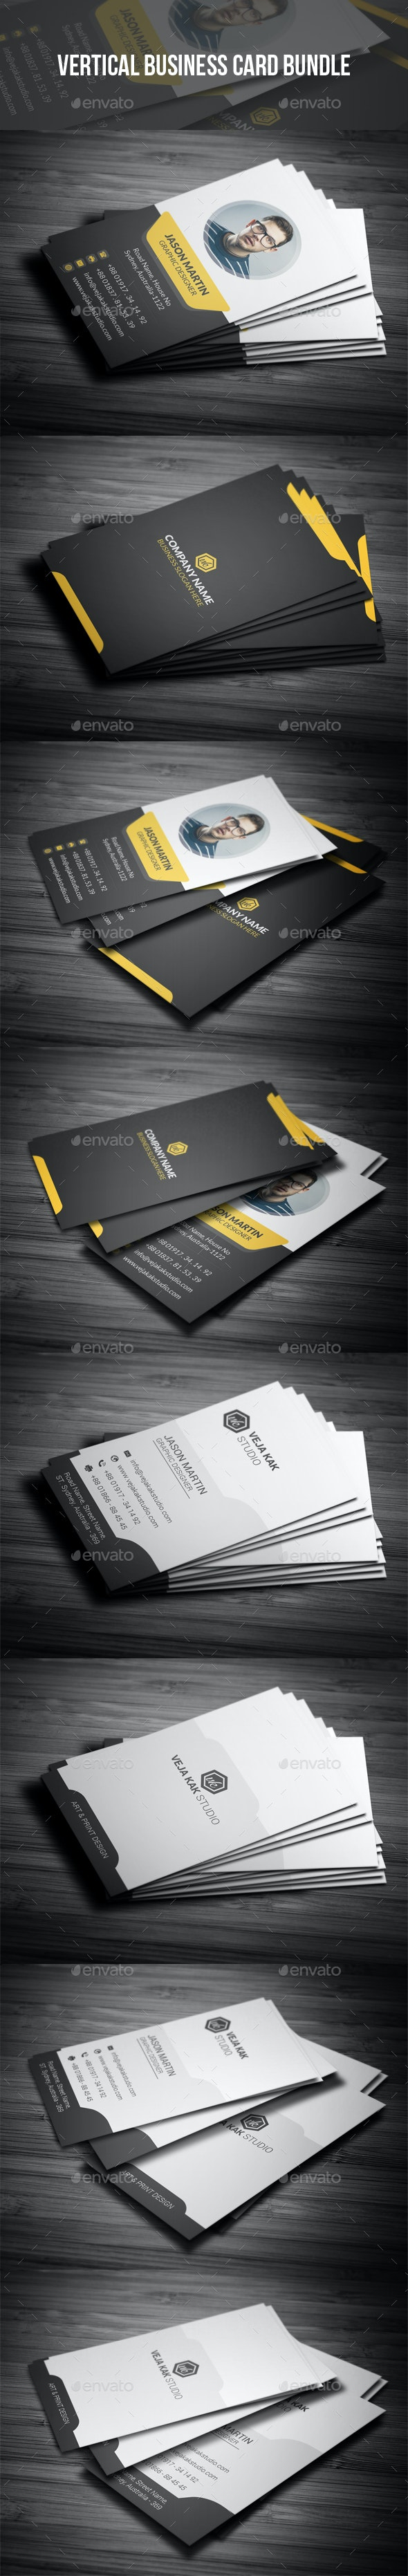 Vertical Business Card Bundle - Creative Business Cards